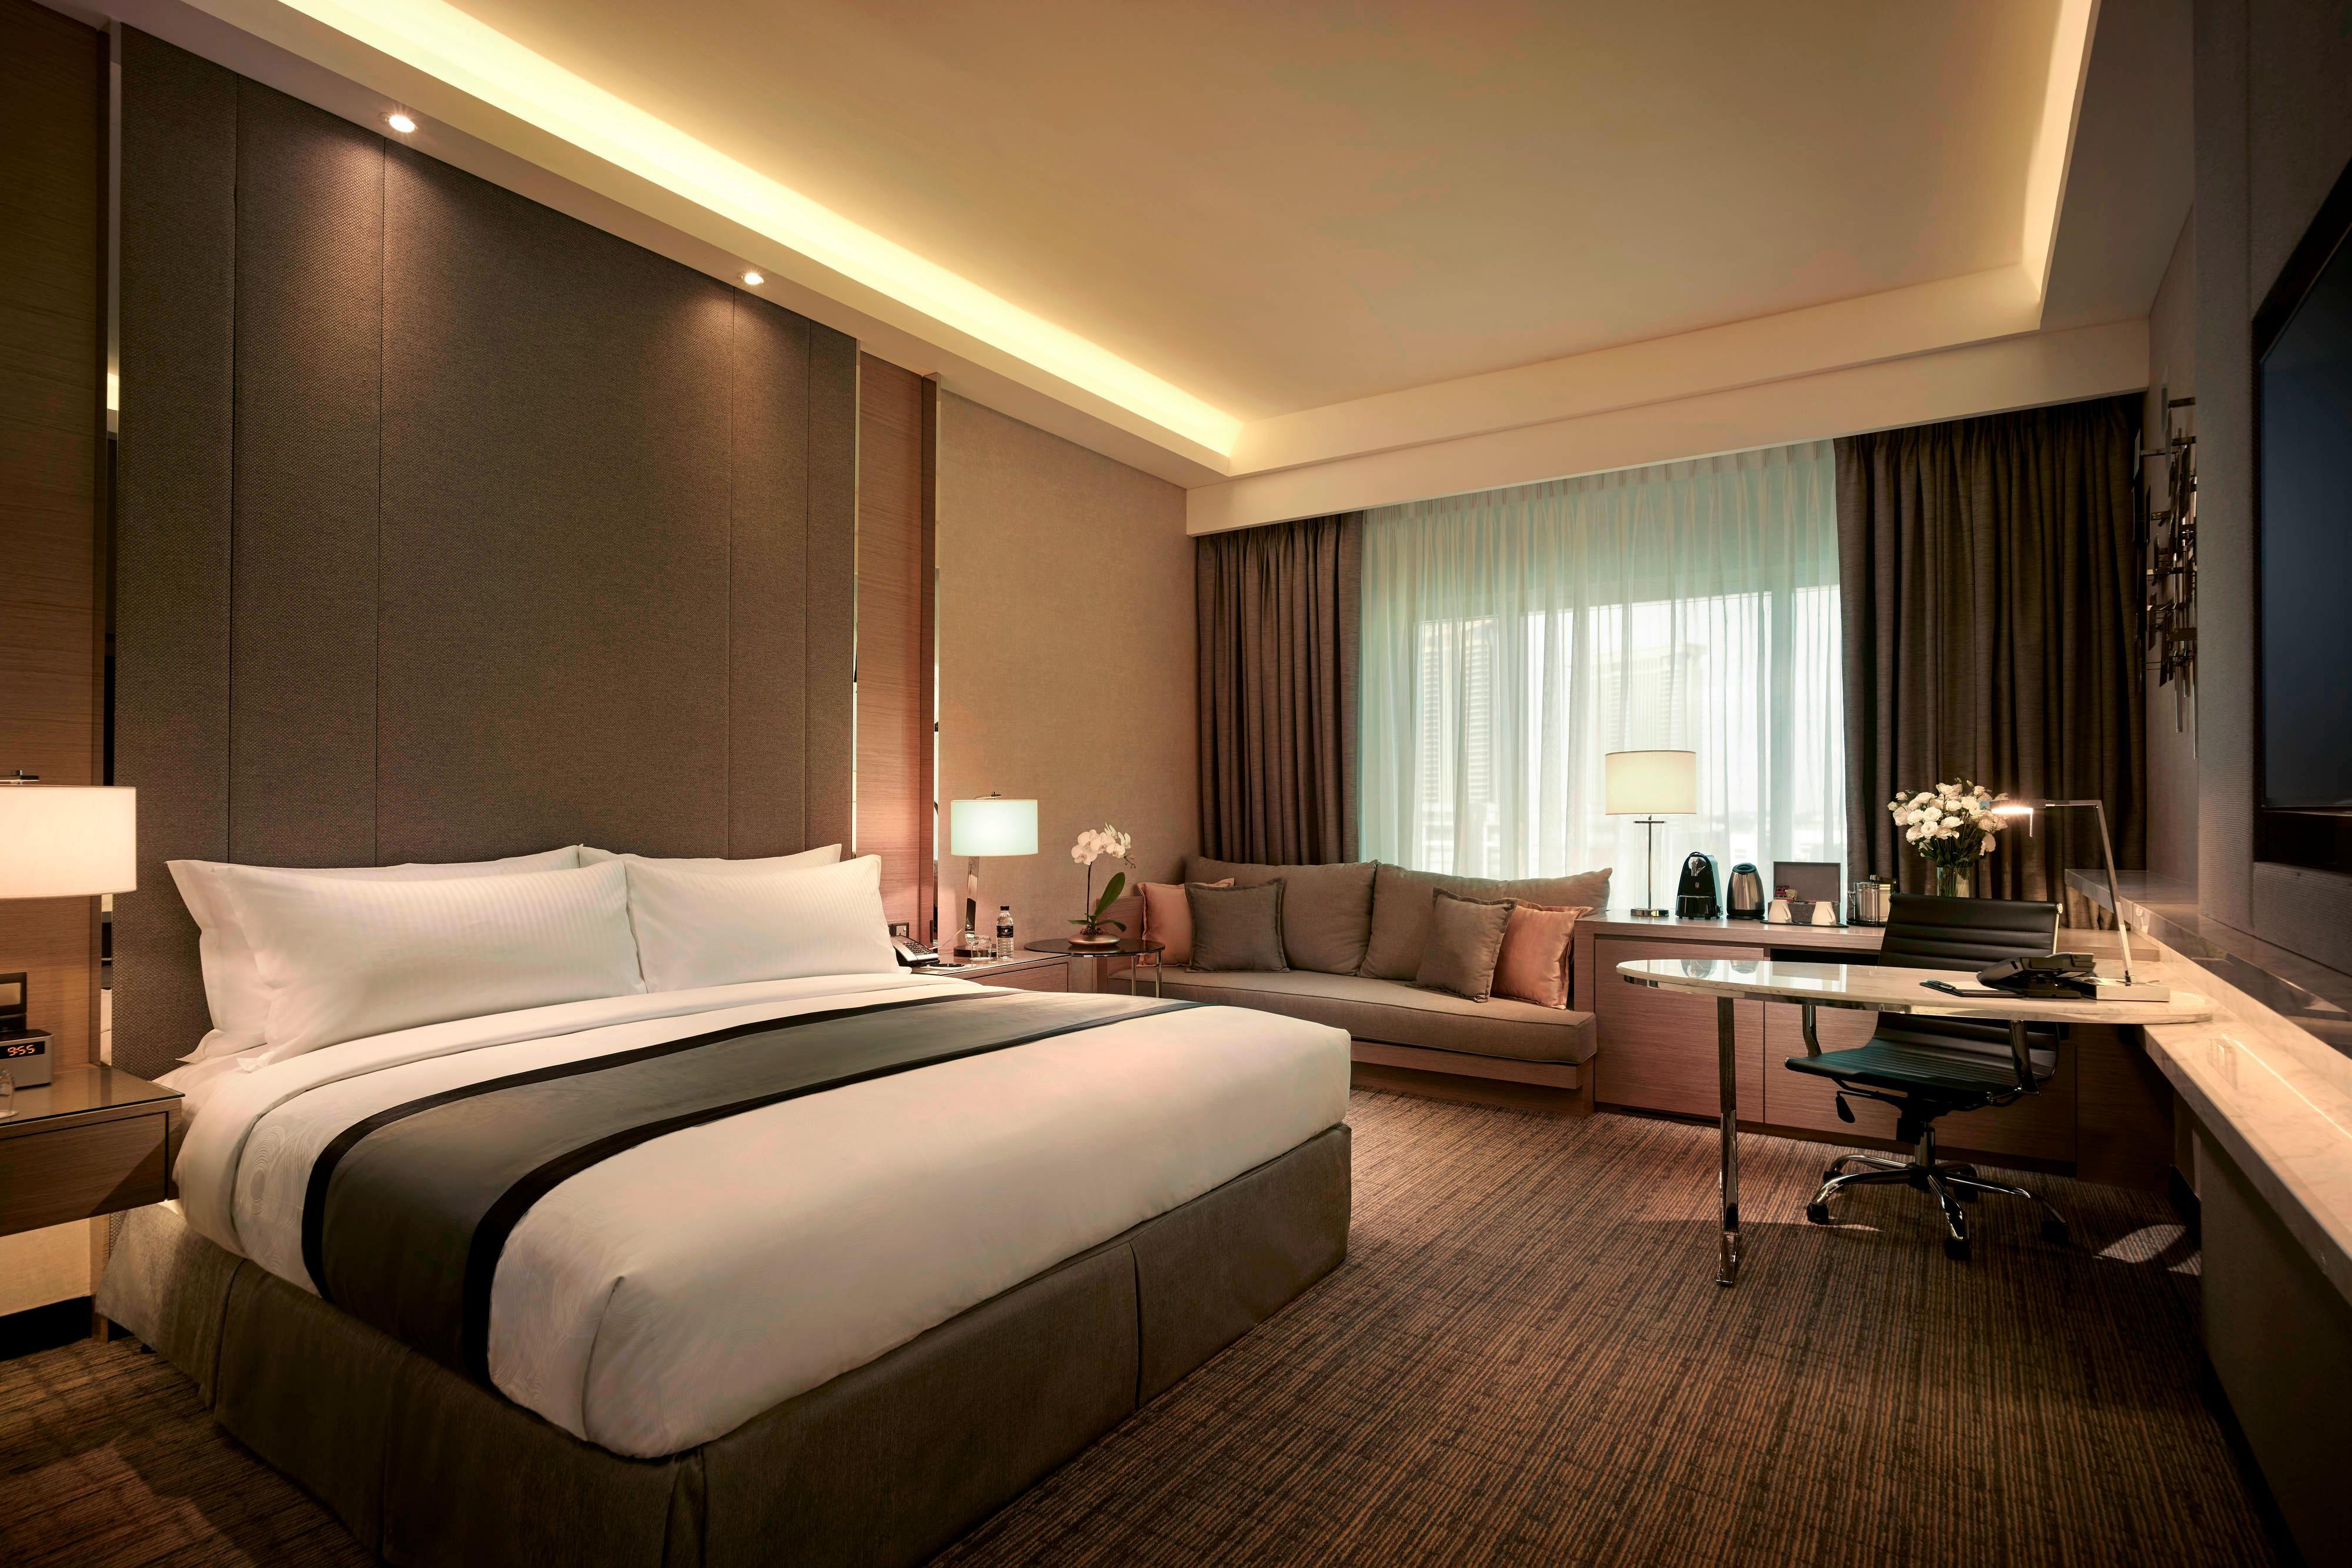 Luxury Kuala Lumper Hotel Jw Marriott Lumpur